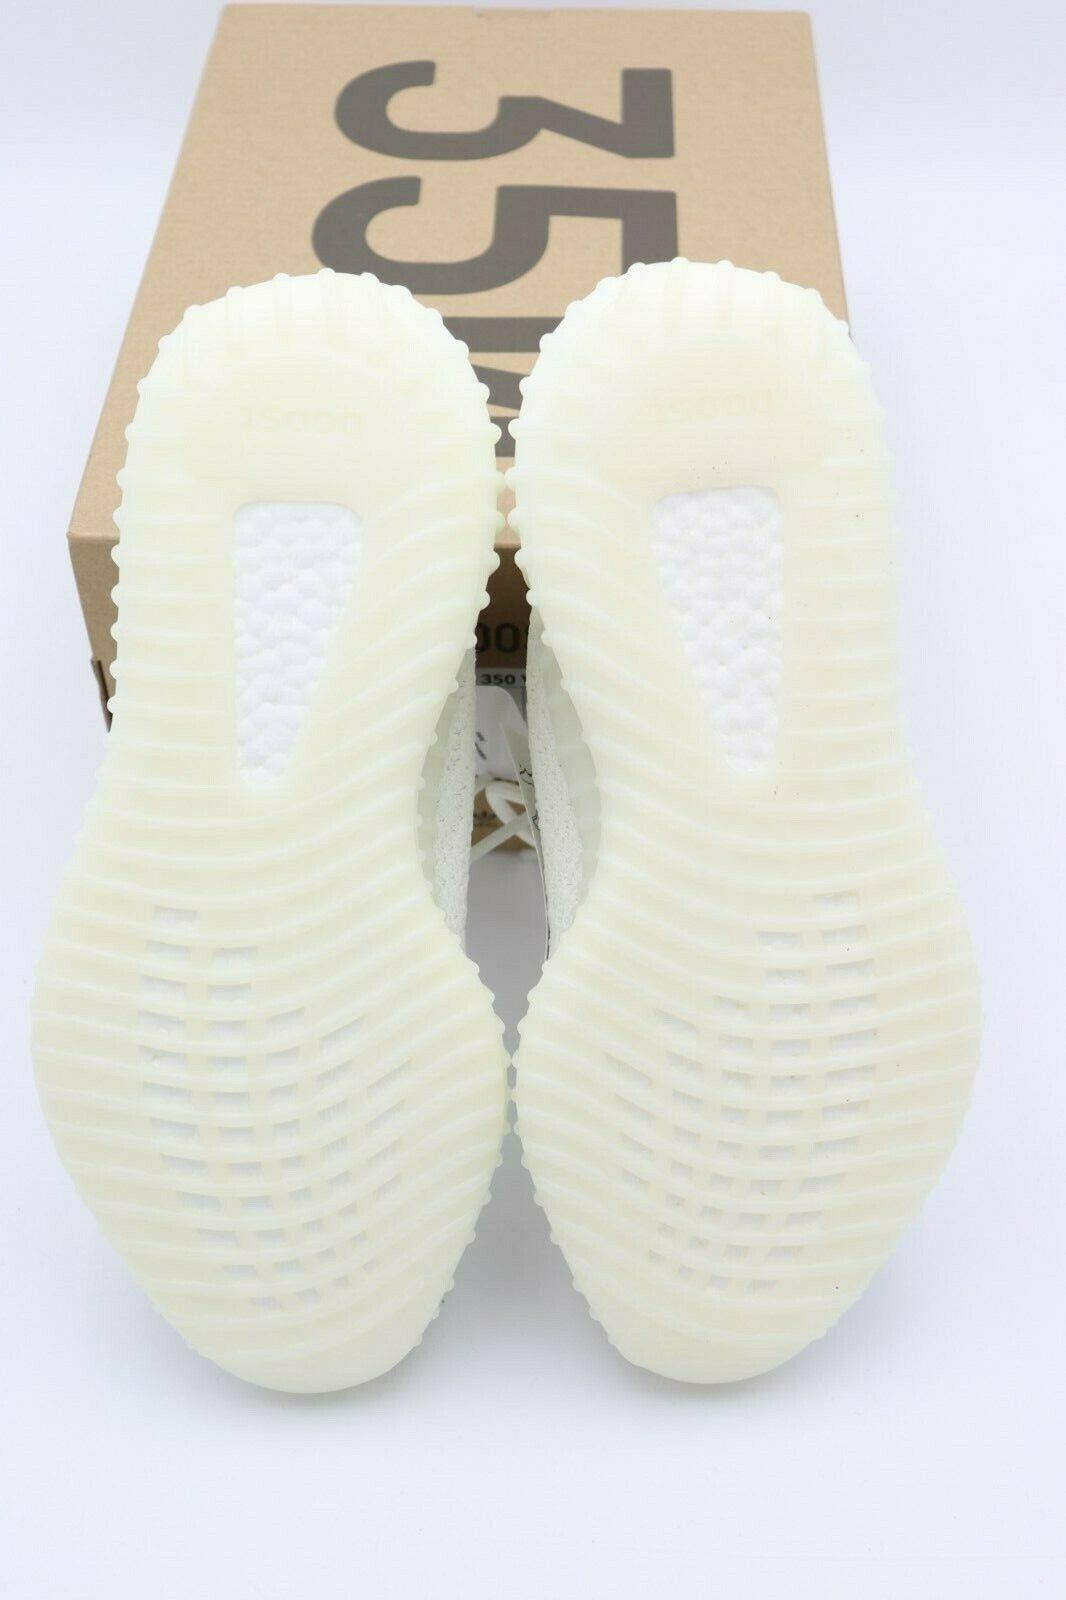 Neu in Box Adidas Yeezy Boost 350 V2 Triple Weiß Neu Größe 8 image 7